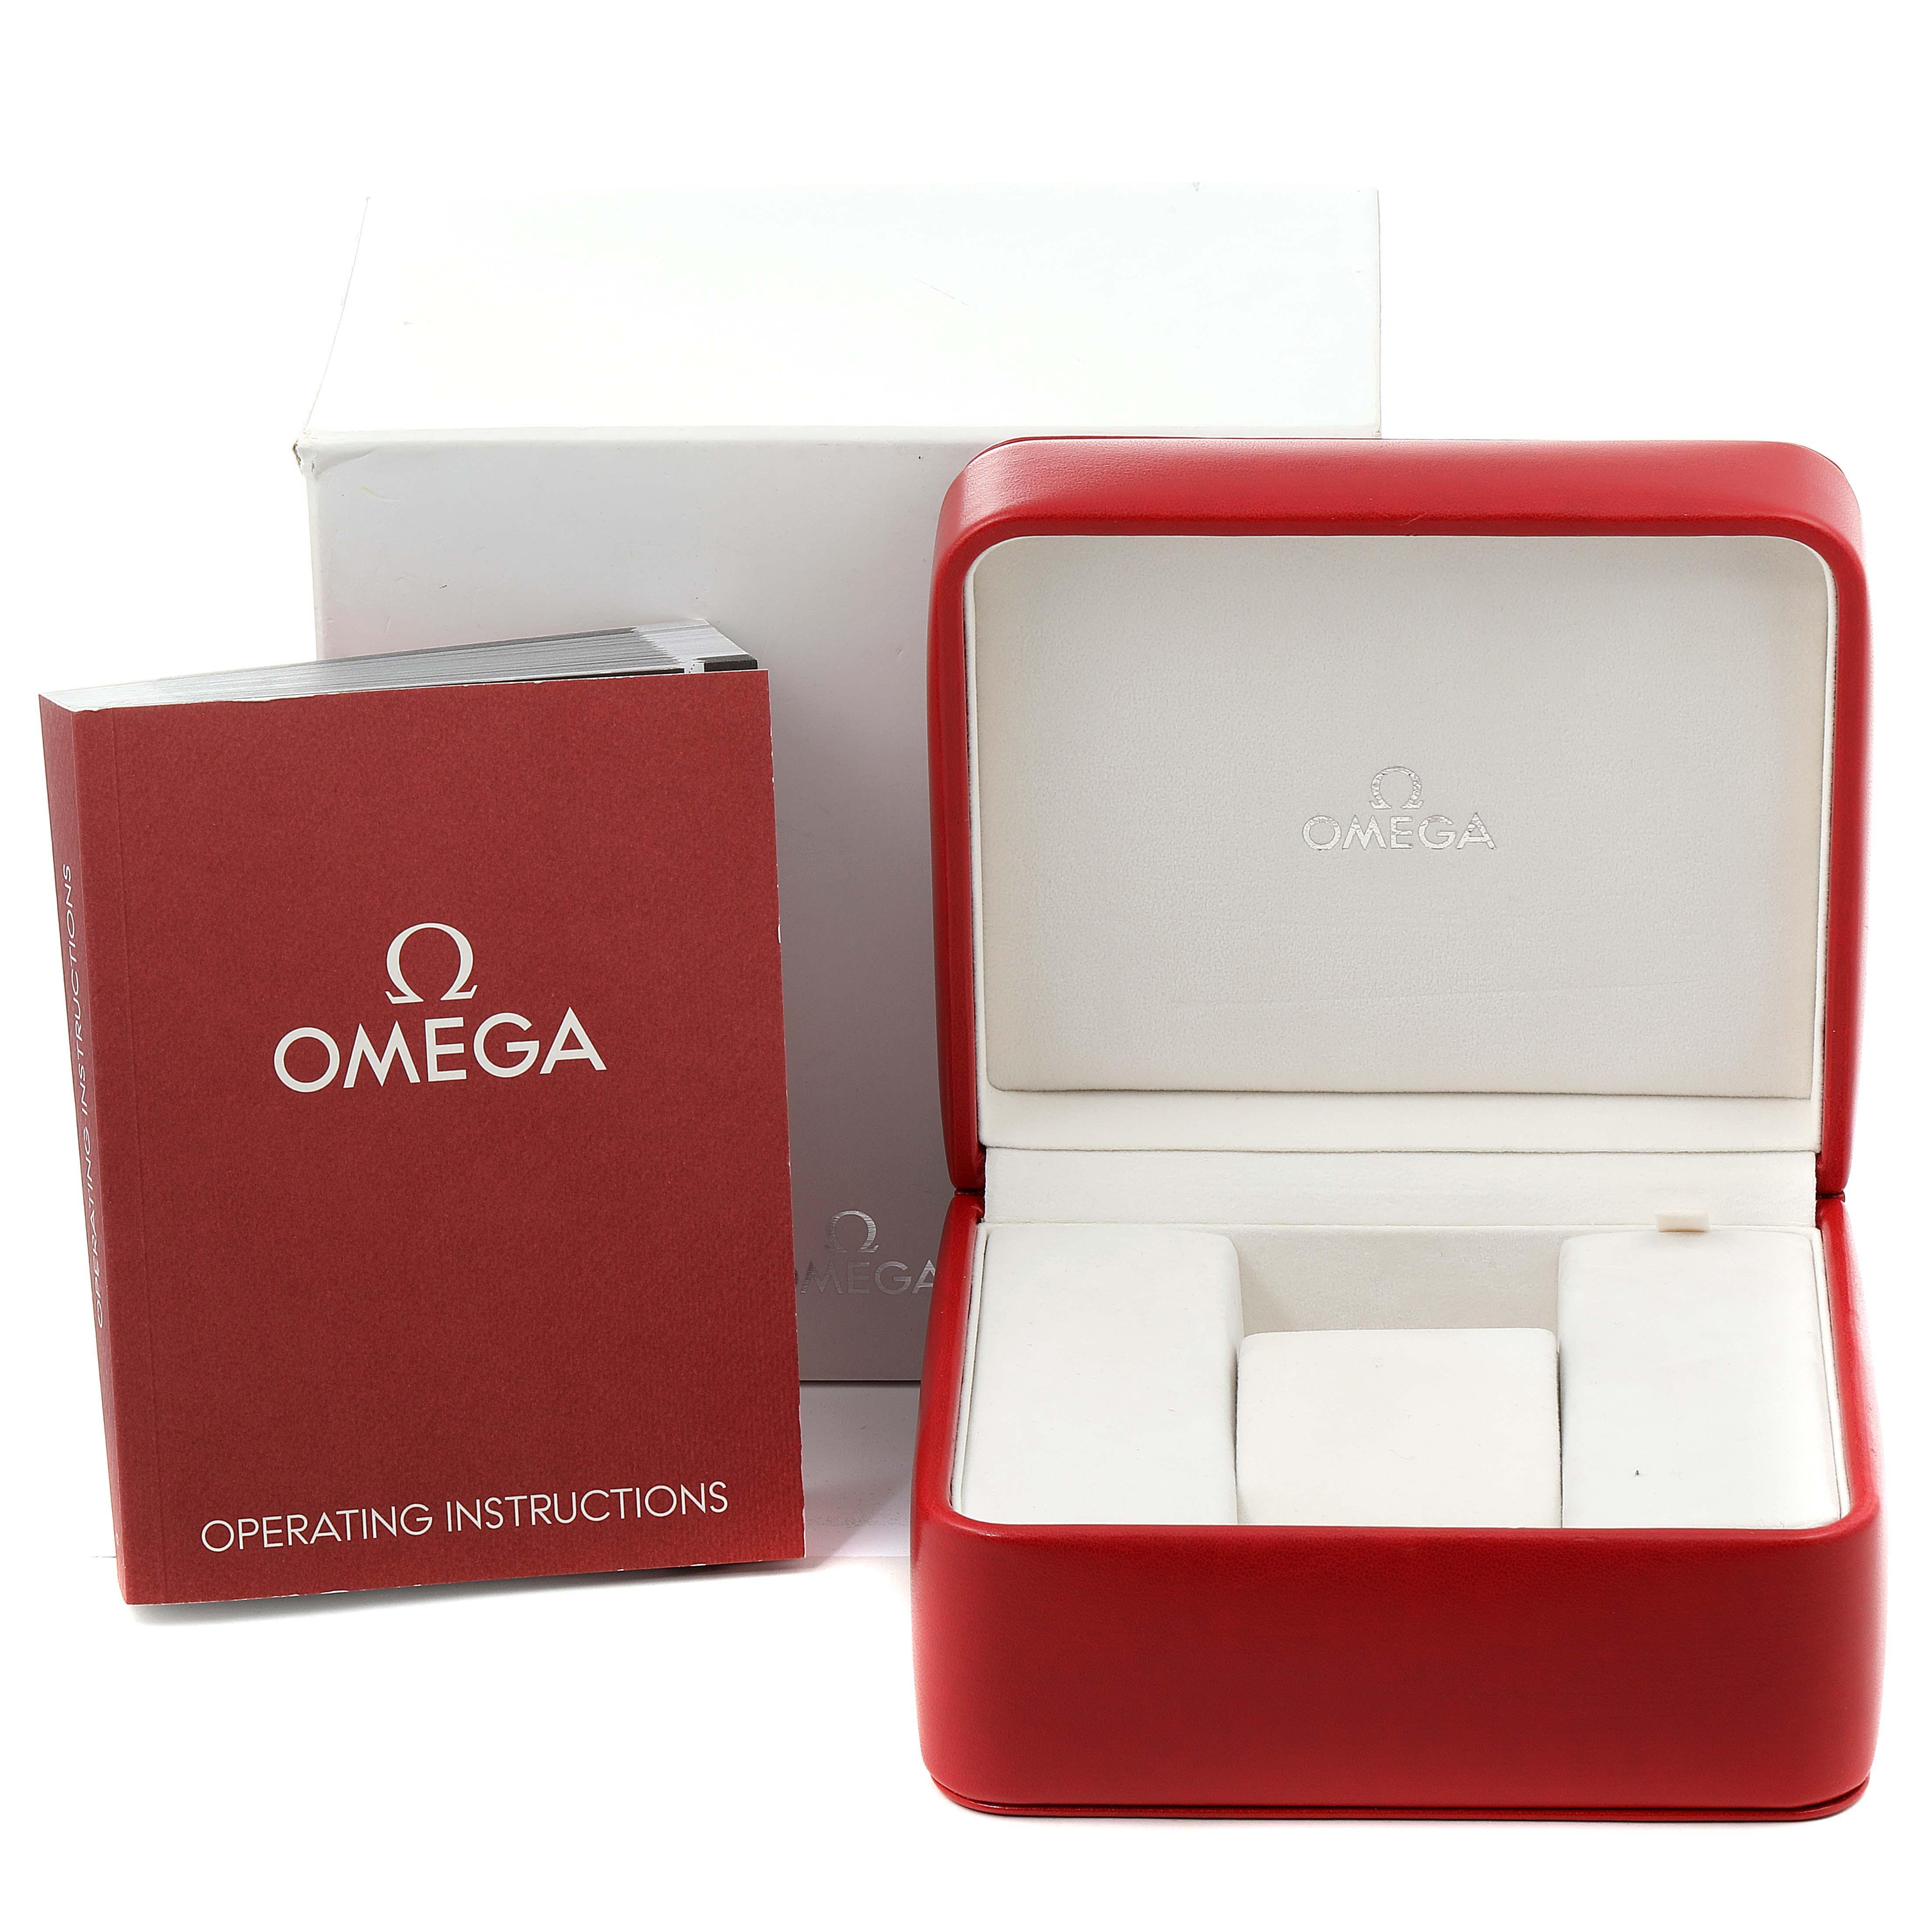 Omega Seamaster Planet Ocean Orange Bezel Watch 232.30.42.21.01.002 Box SwissWatchExpo